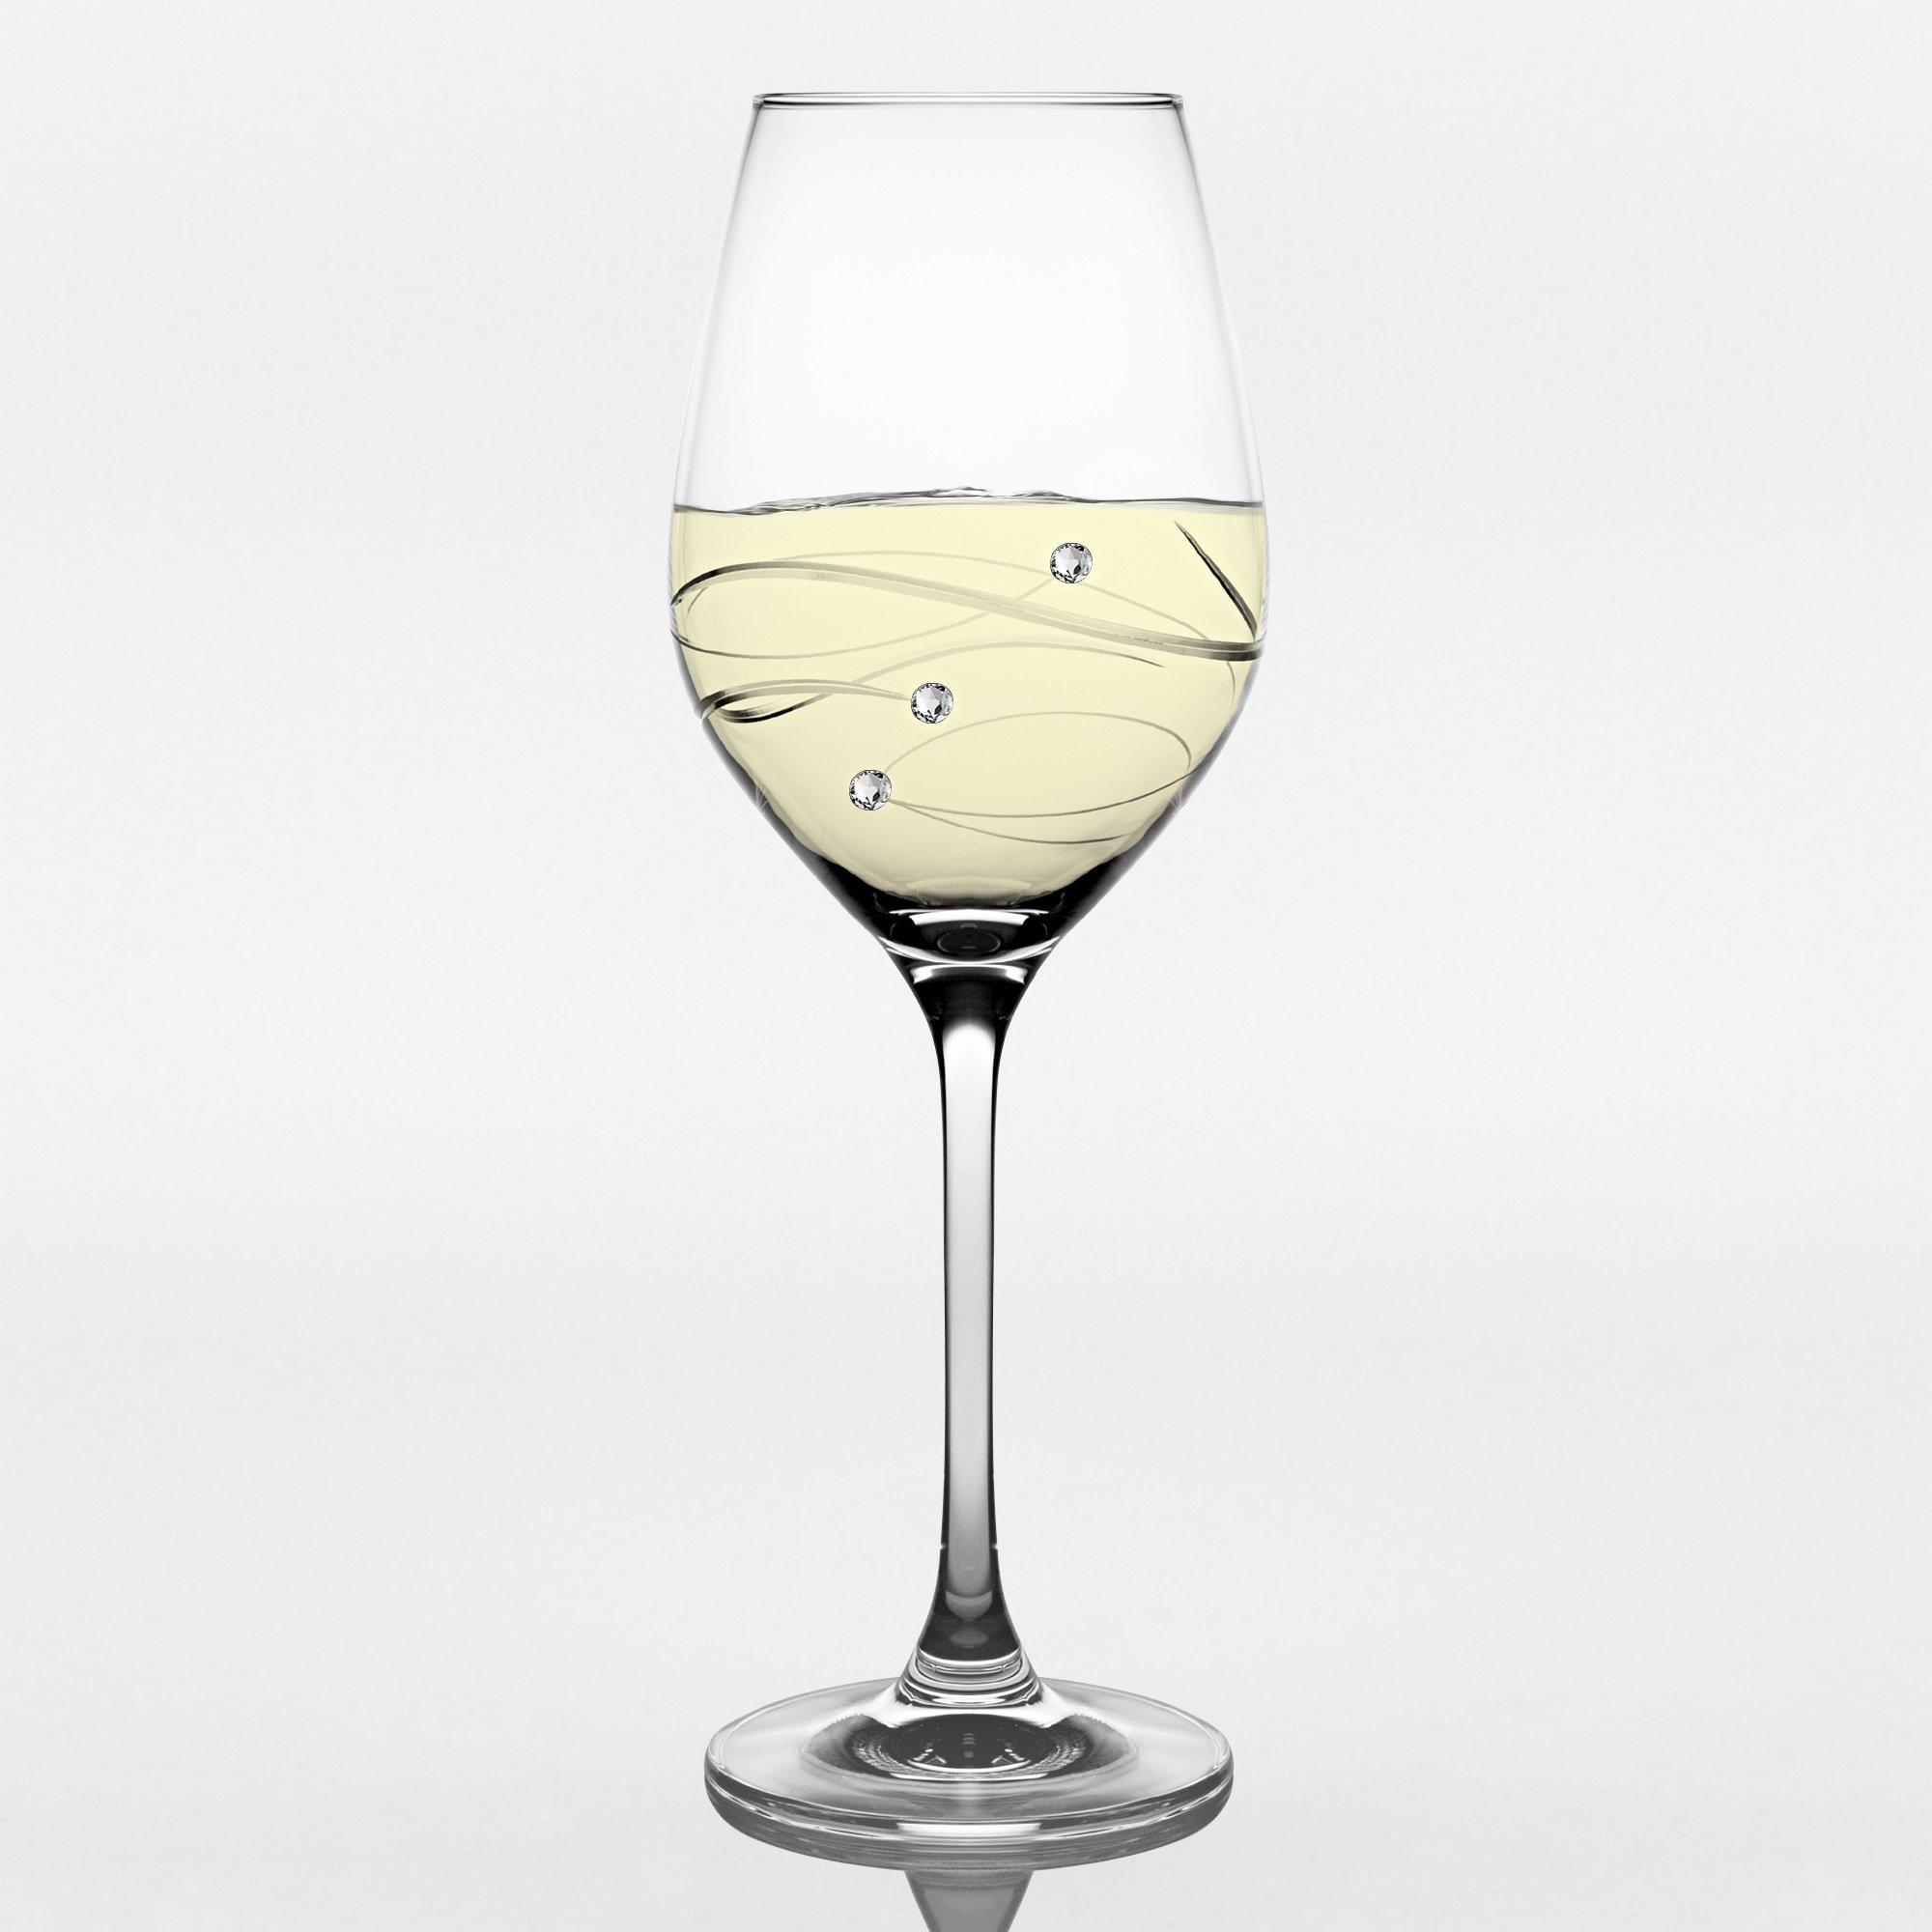 Barski - Handmade Glass - Sparkle - White Wine Glass - Decorated with Real Swarovski Diamonds - Gift Boxed - 12.5 oz. - Made in Europe - Set of 4